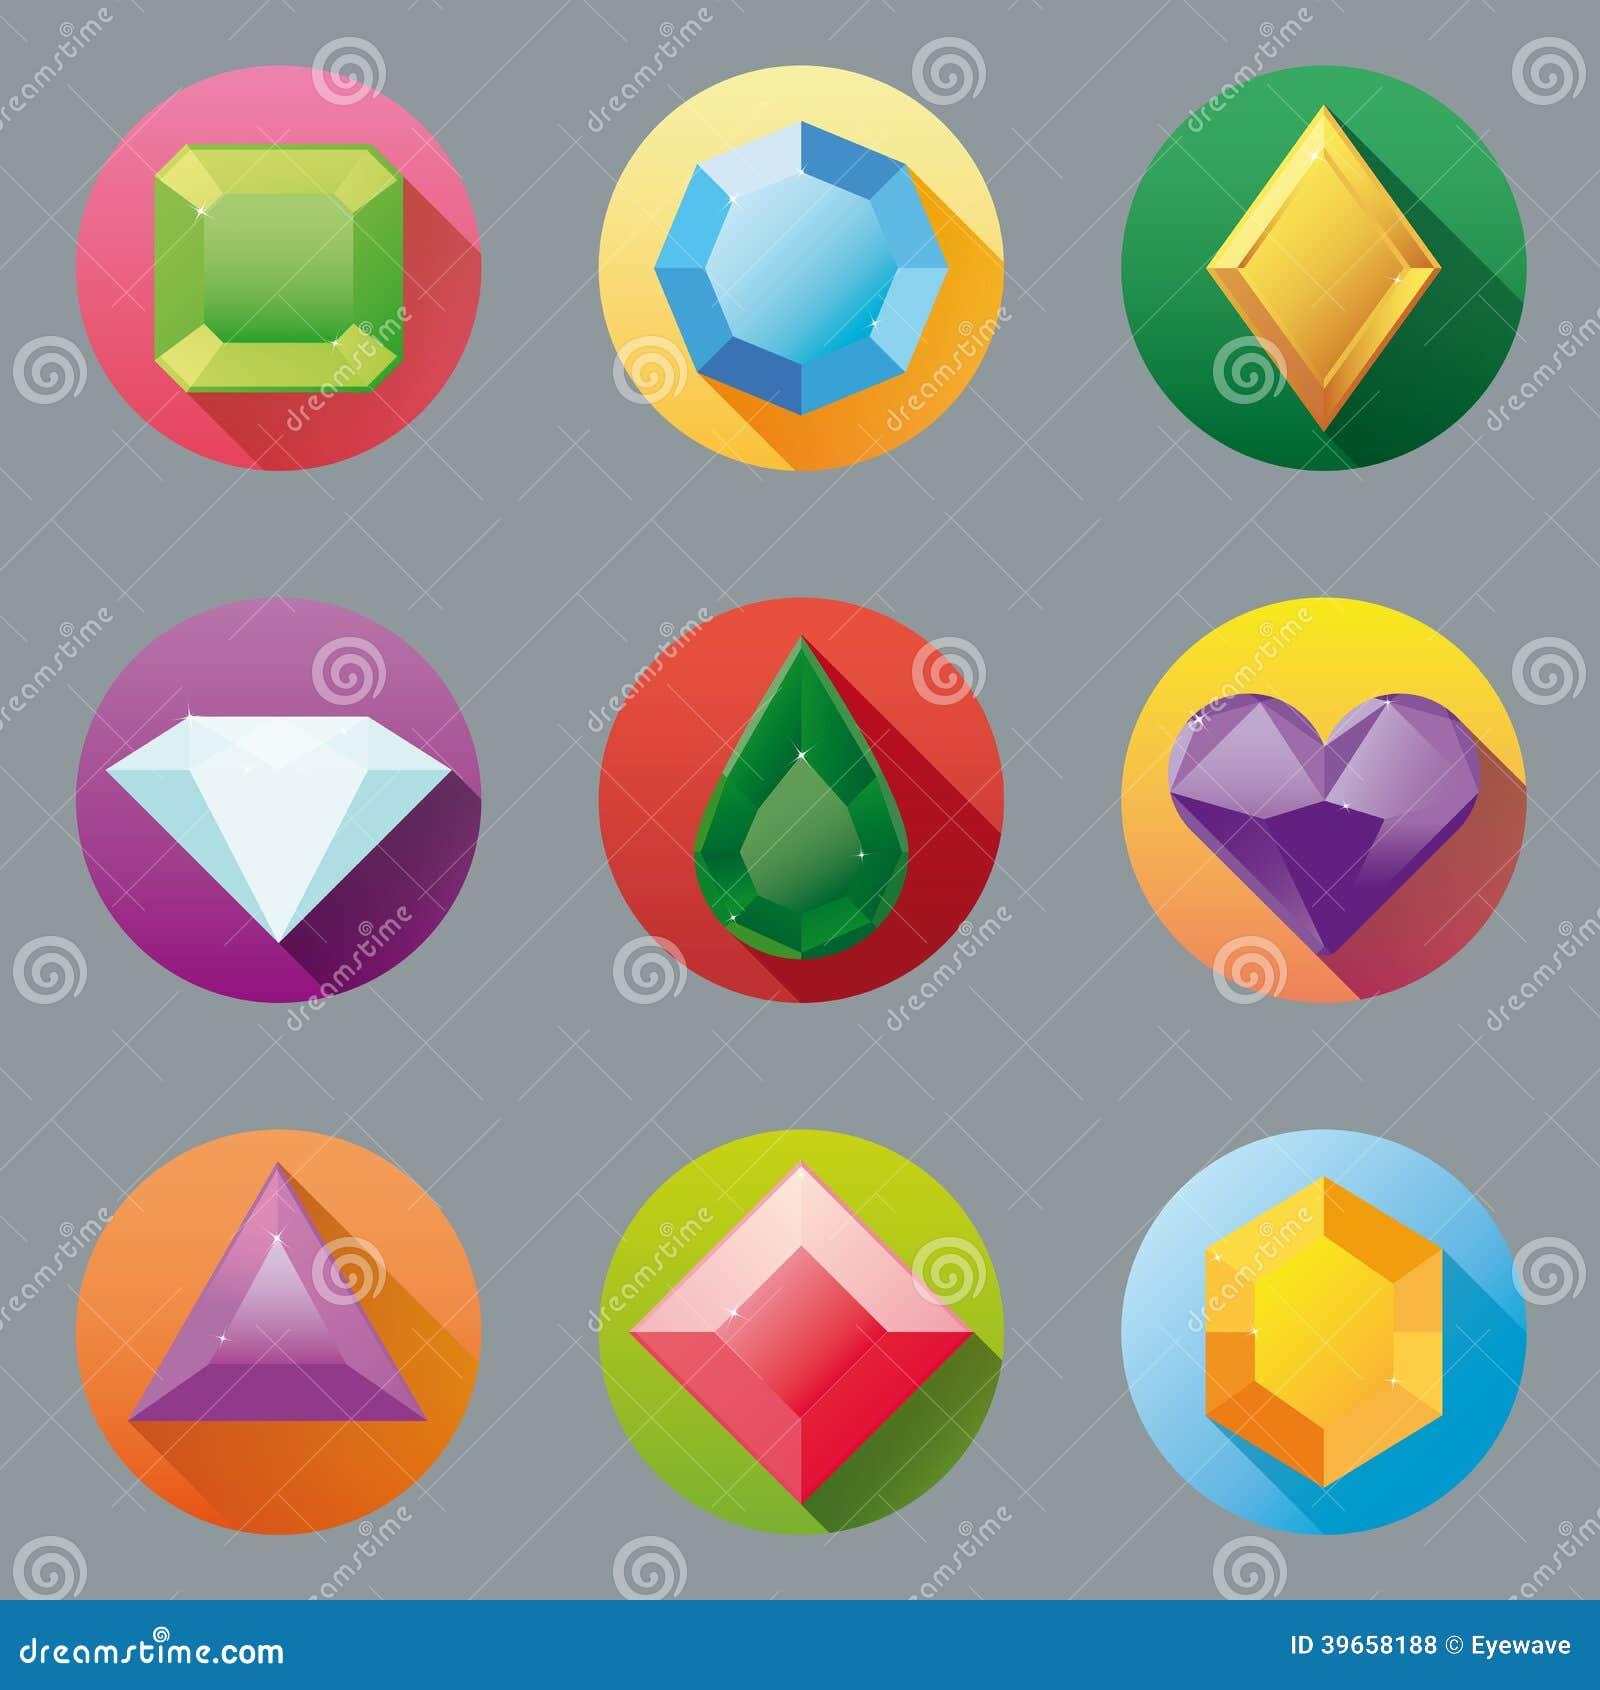 Flat Design Gem Icon Collection Stock Photo Image 39658188